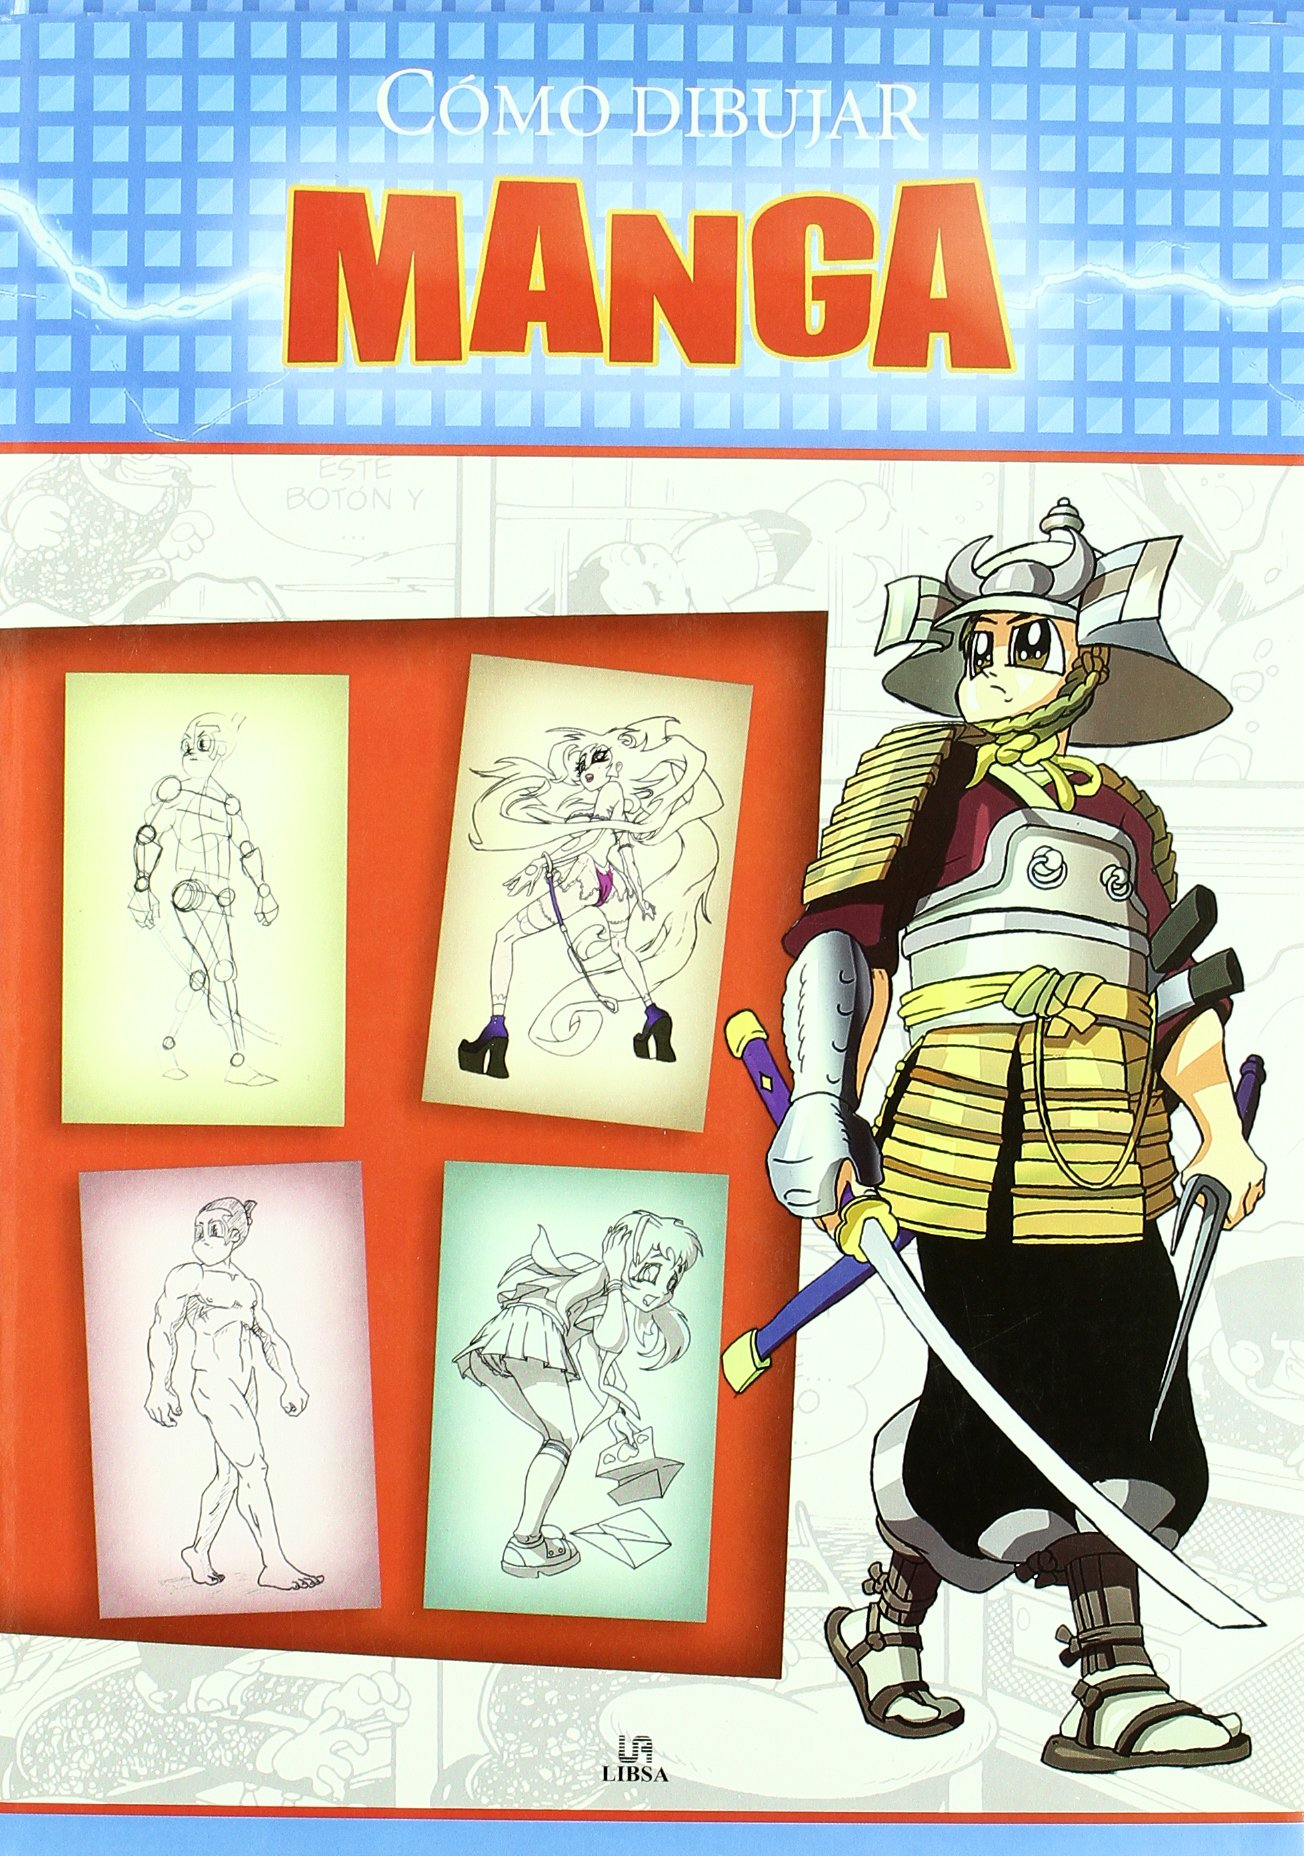 Cómo Dibujar Manga: Amazon.es: Jorge Mata, Camilo Otaku: Libros